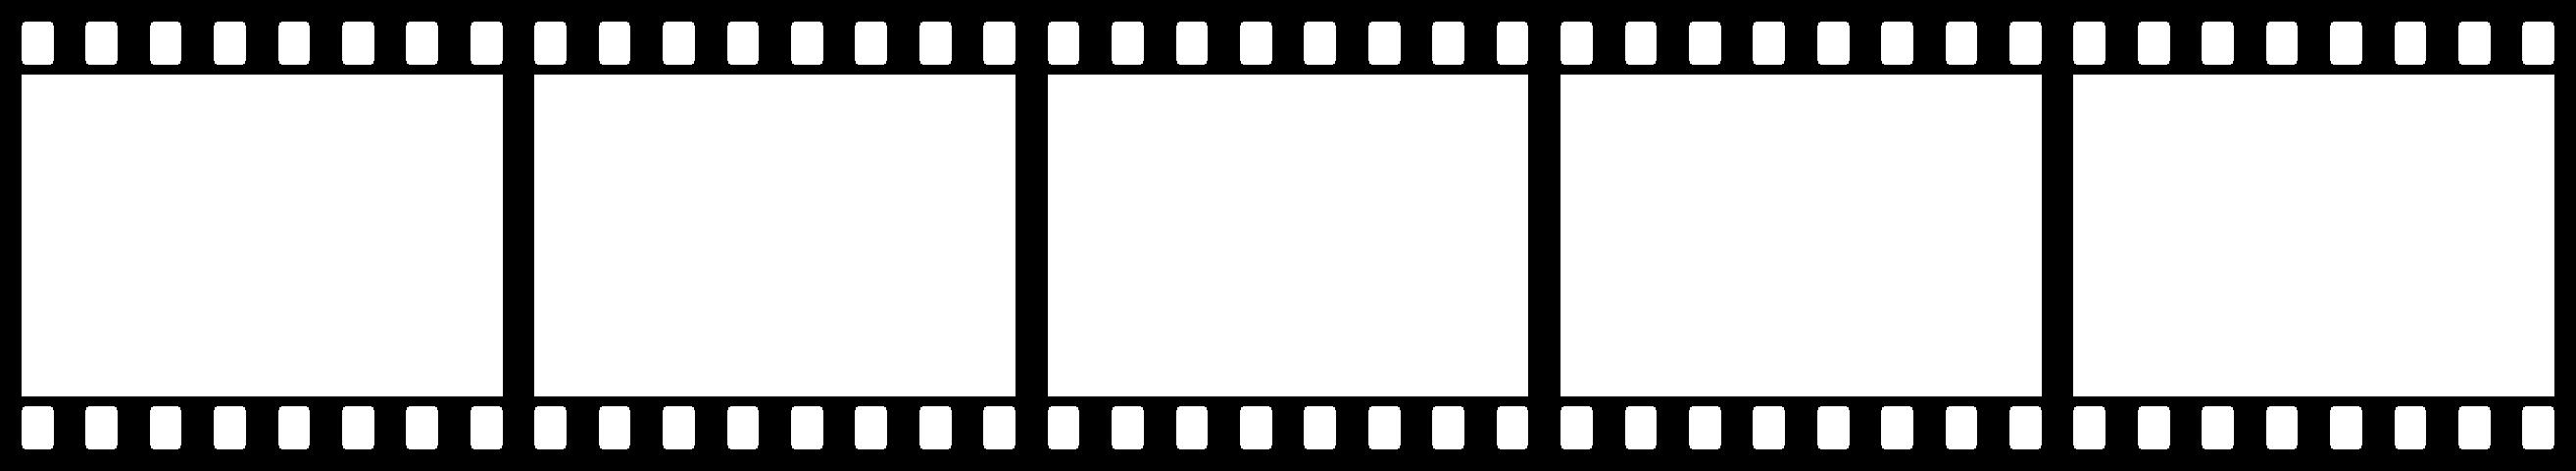 2628x480 Filmstrip Transparent Png Pictures